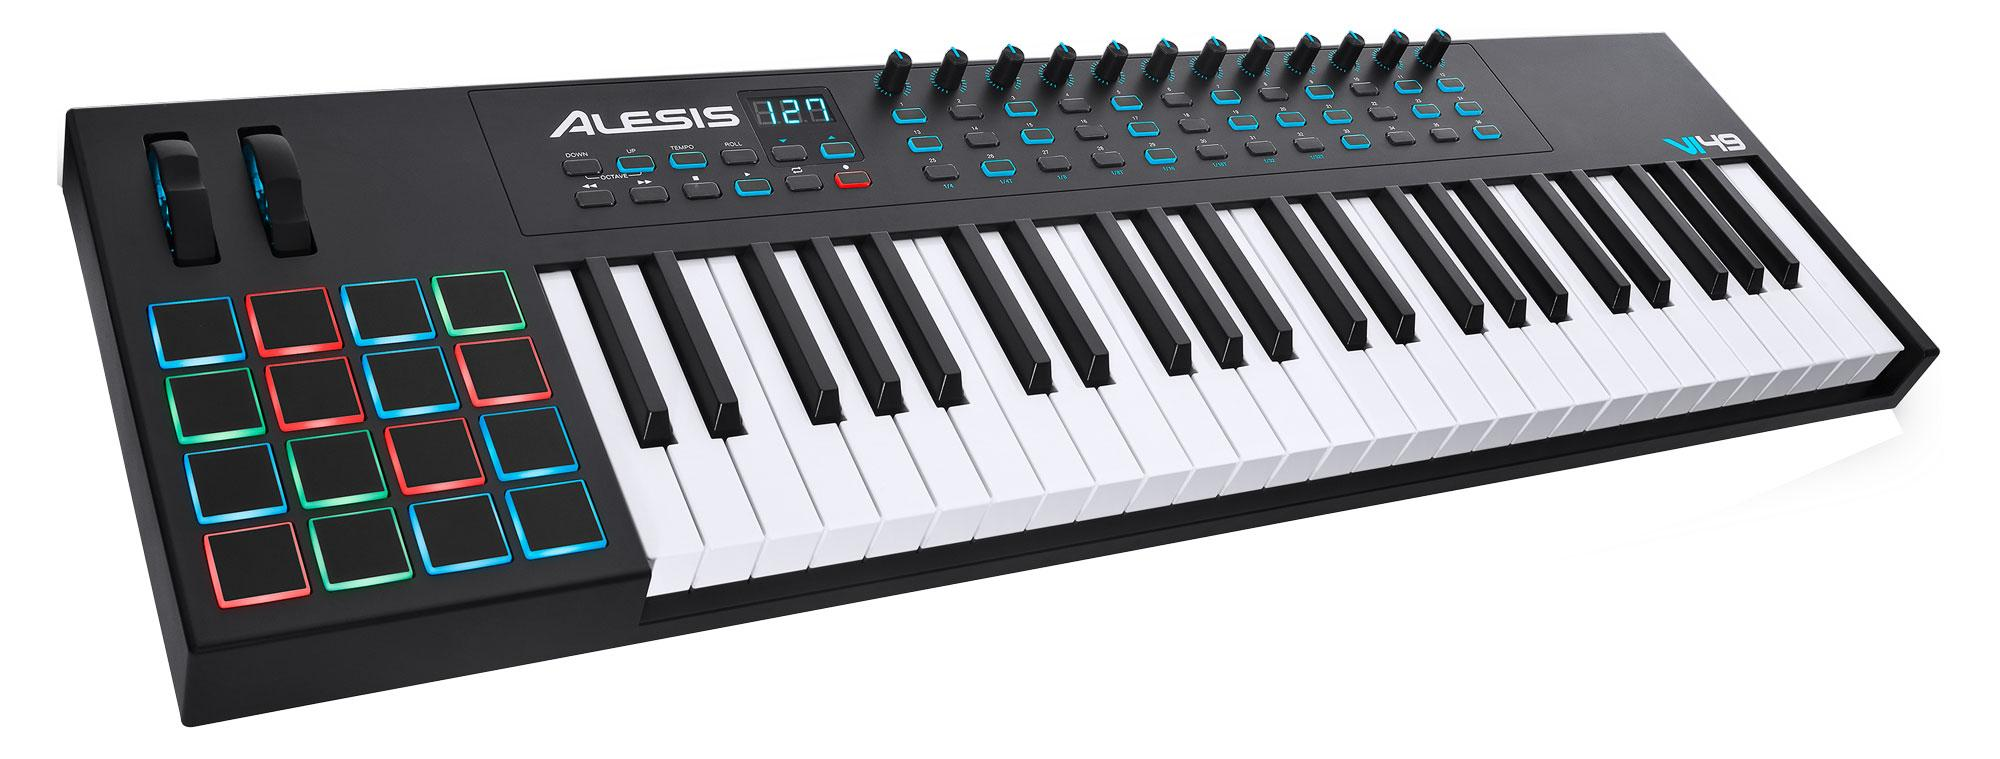 Midimasterkeyboards - Alesis VI49 USB MIDI Pad|Keyboard Controller mit 49 Tasten - Onlineshop Musikhaus Kirstein